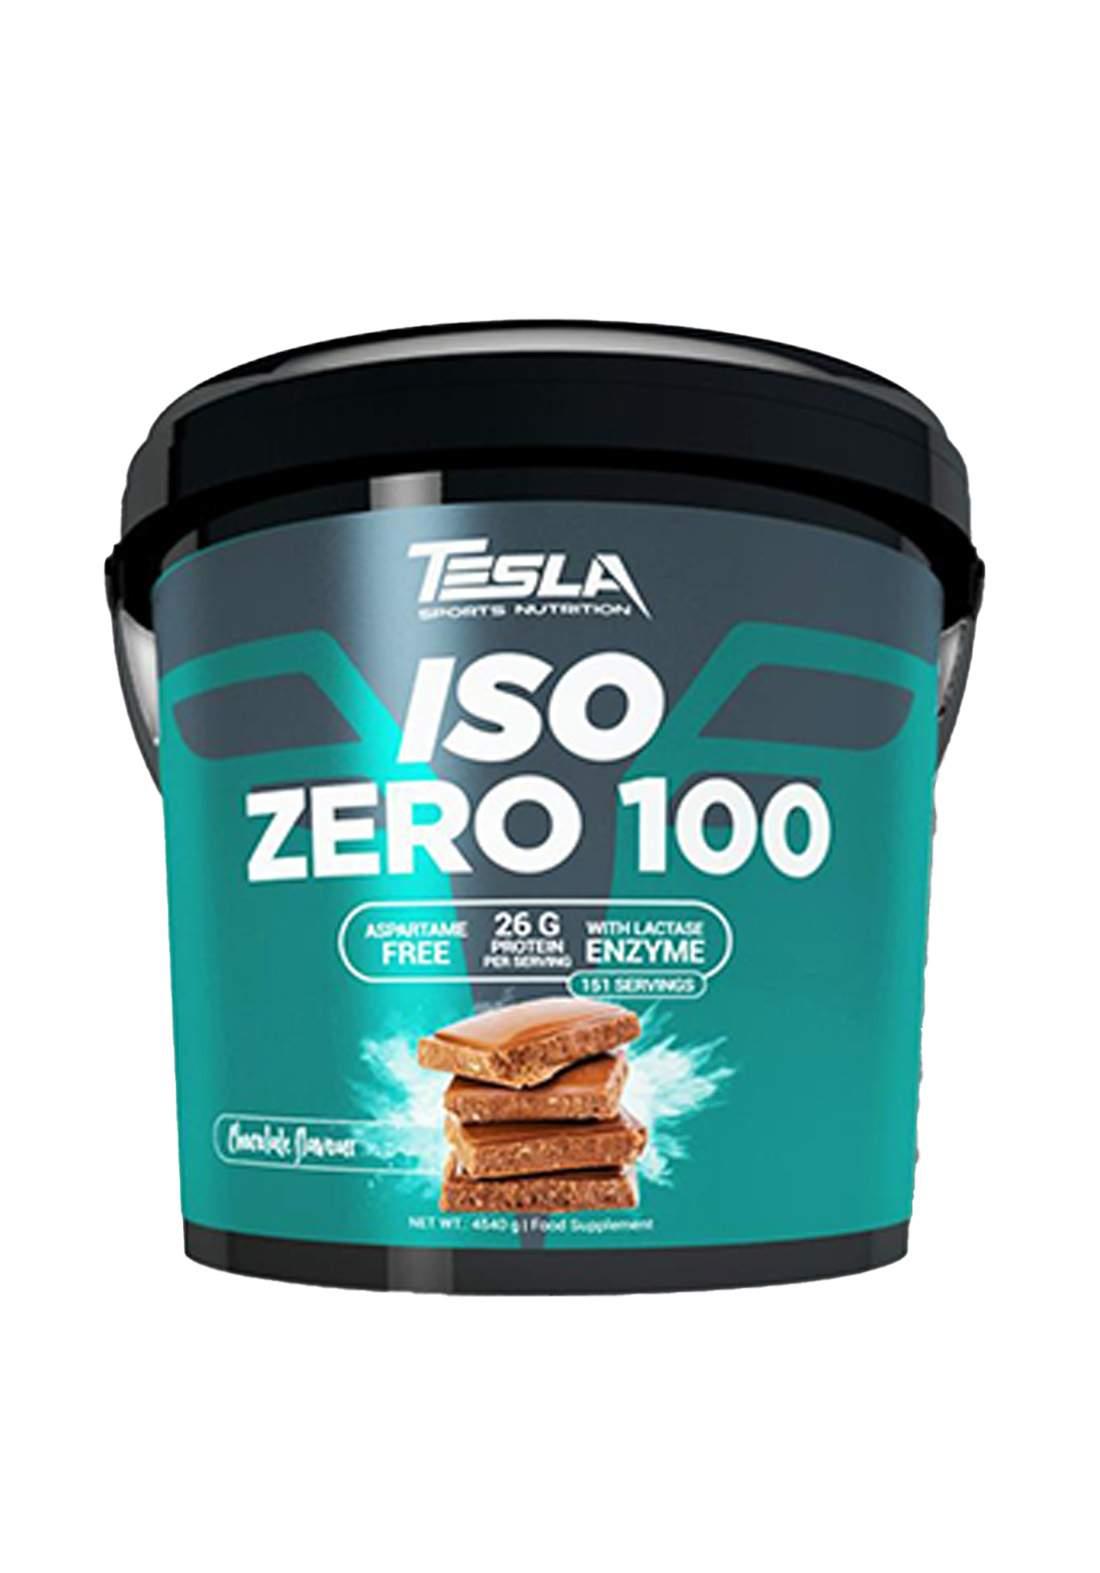 Tesla Iso Zero 100  Chocolate Flavor 4.5kg  مكمل غذائي بنكهة الشوكولاتة